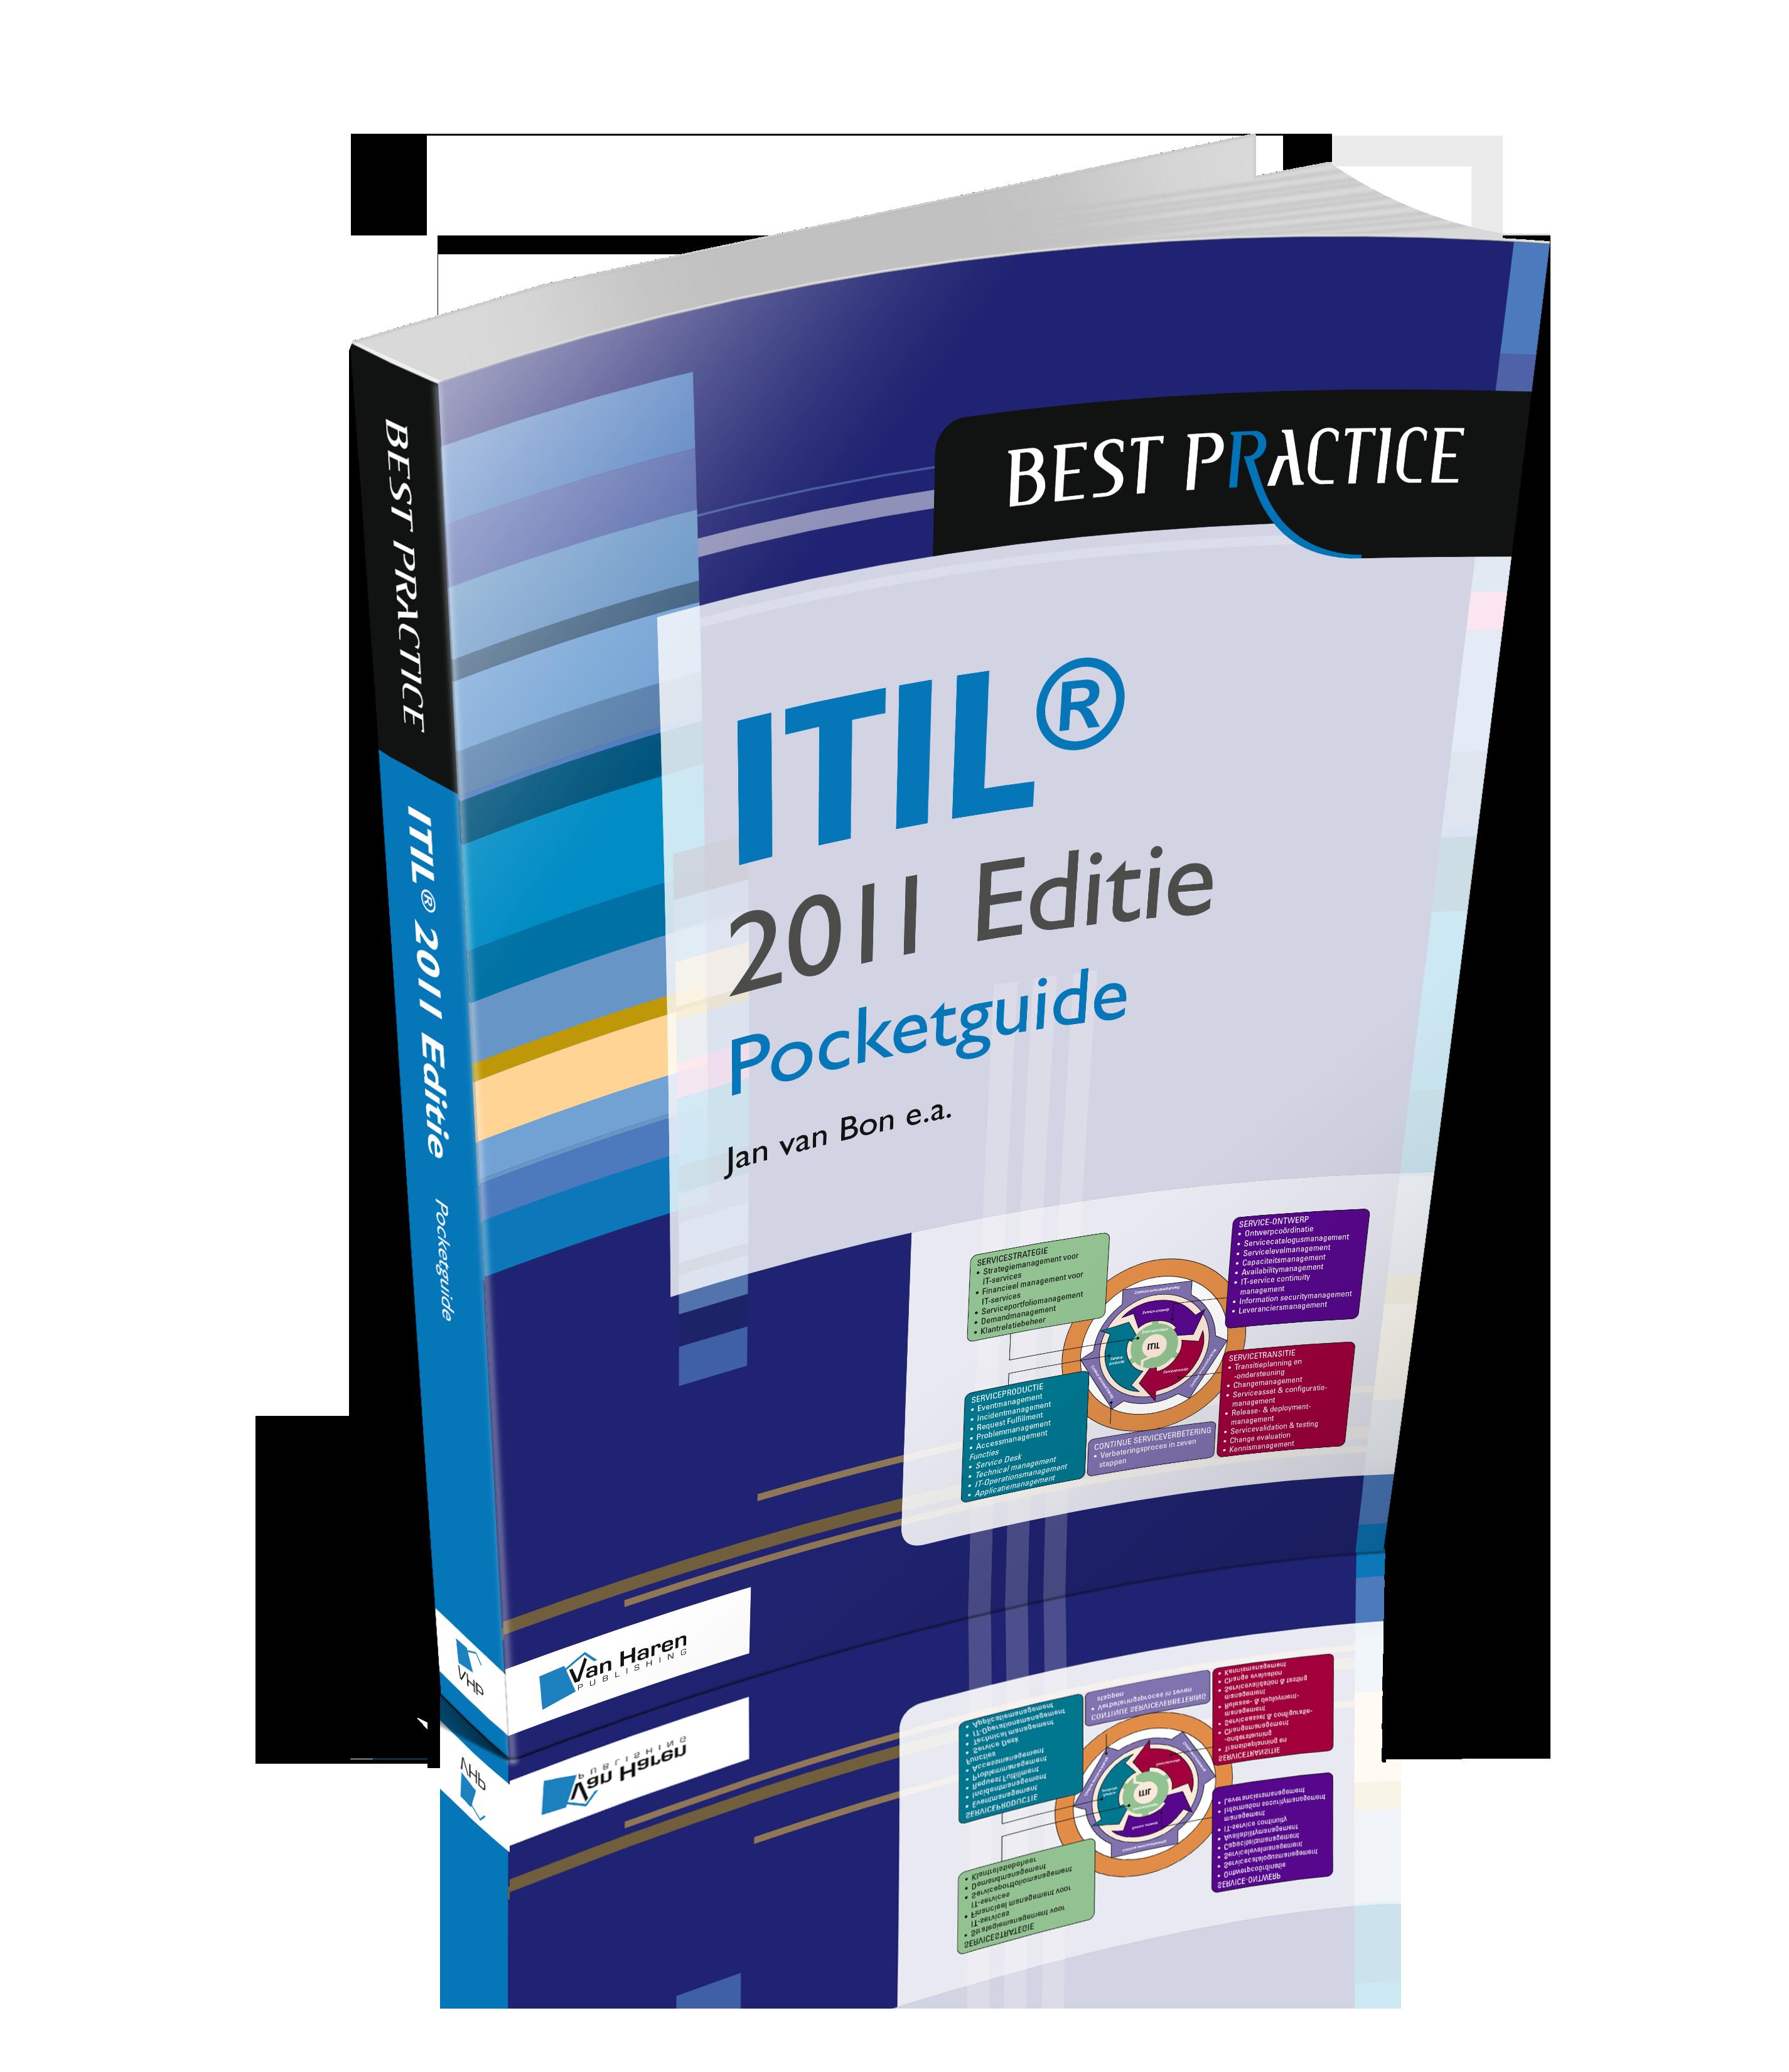 Cover_IT_ITIL_120x165_13,5mm_v4_3D